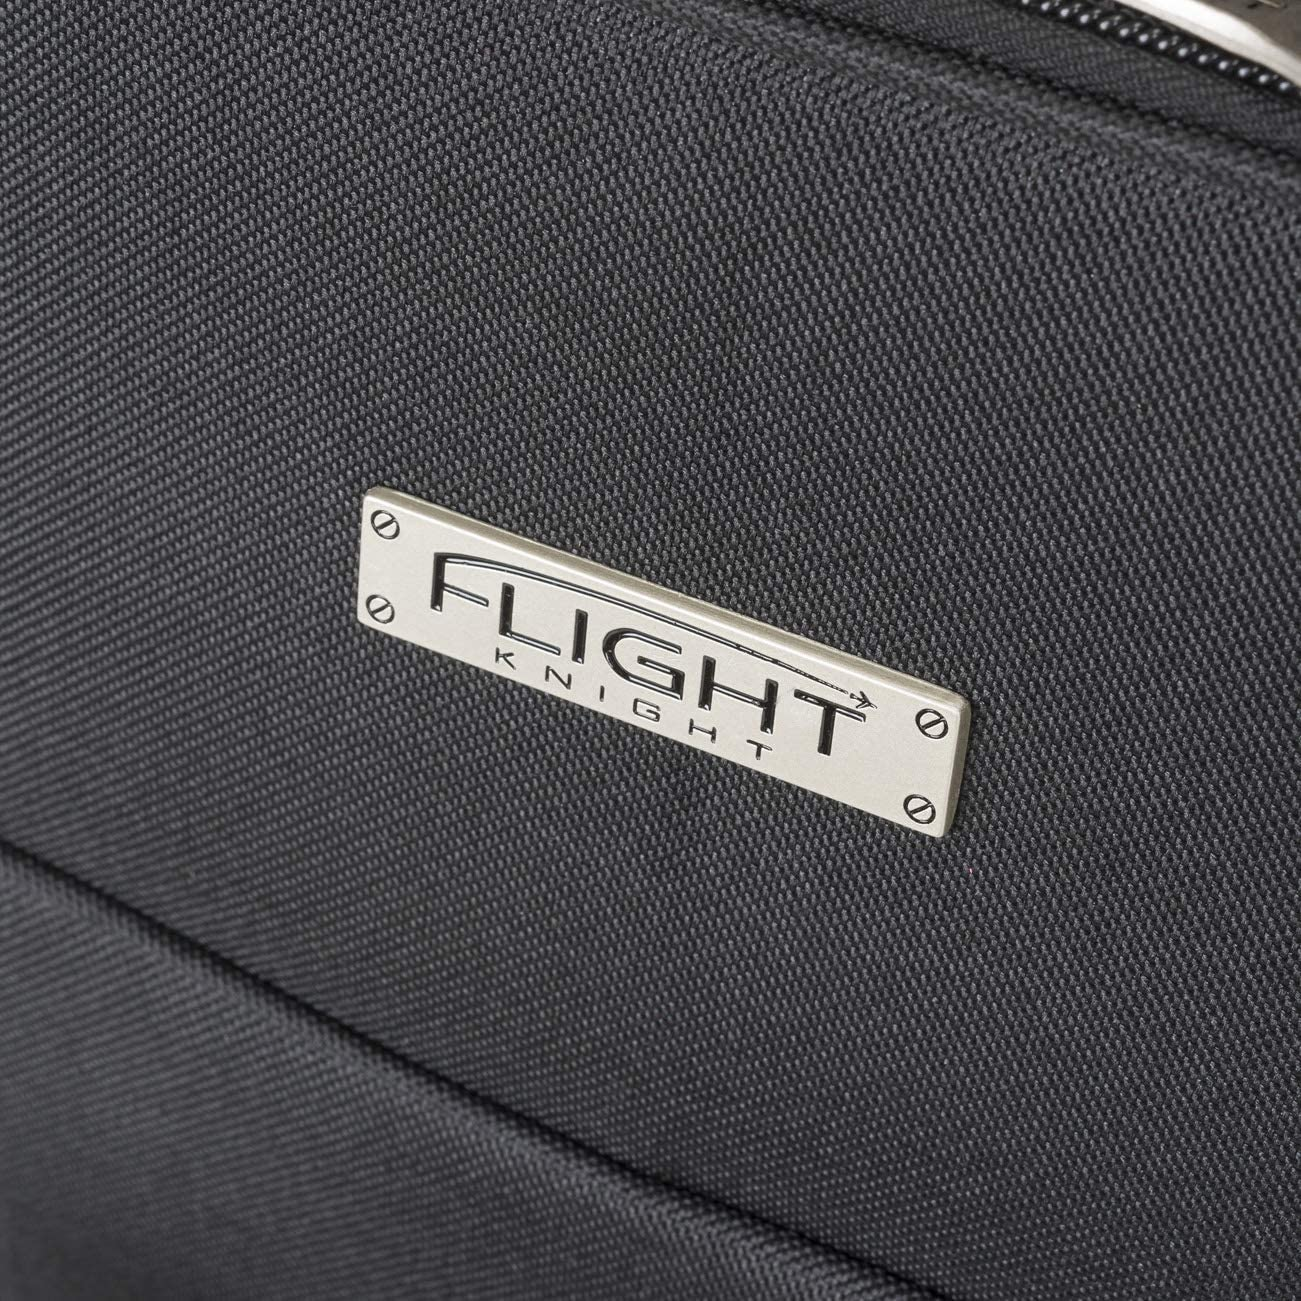 Et Bien dautres British Airways Flight Knight Valise Cabine 56x45x25 cm Maximum Permise avec easyJet Bagage a Main Legere Sac Cabine avec 2 Roues.